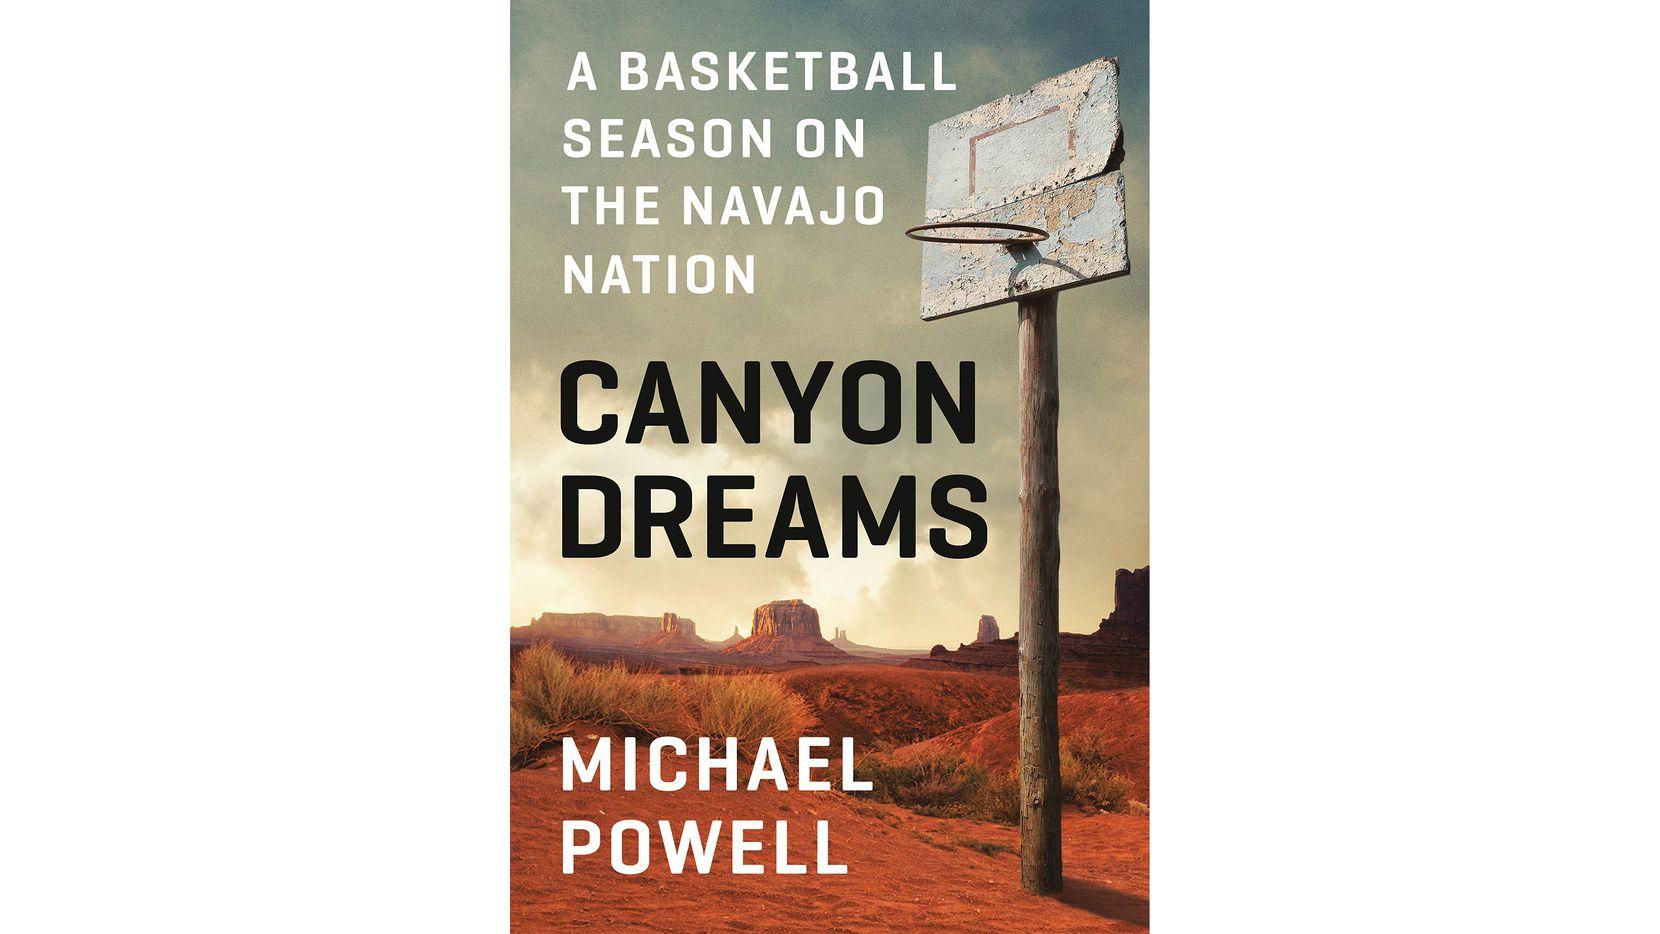 """Canyon Dreams: A Basketball Season on the Navajo Nation"" follows an American Indian team in northern Arizona."